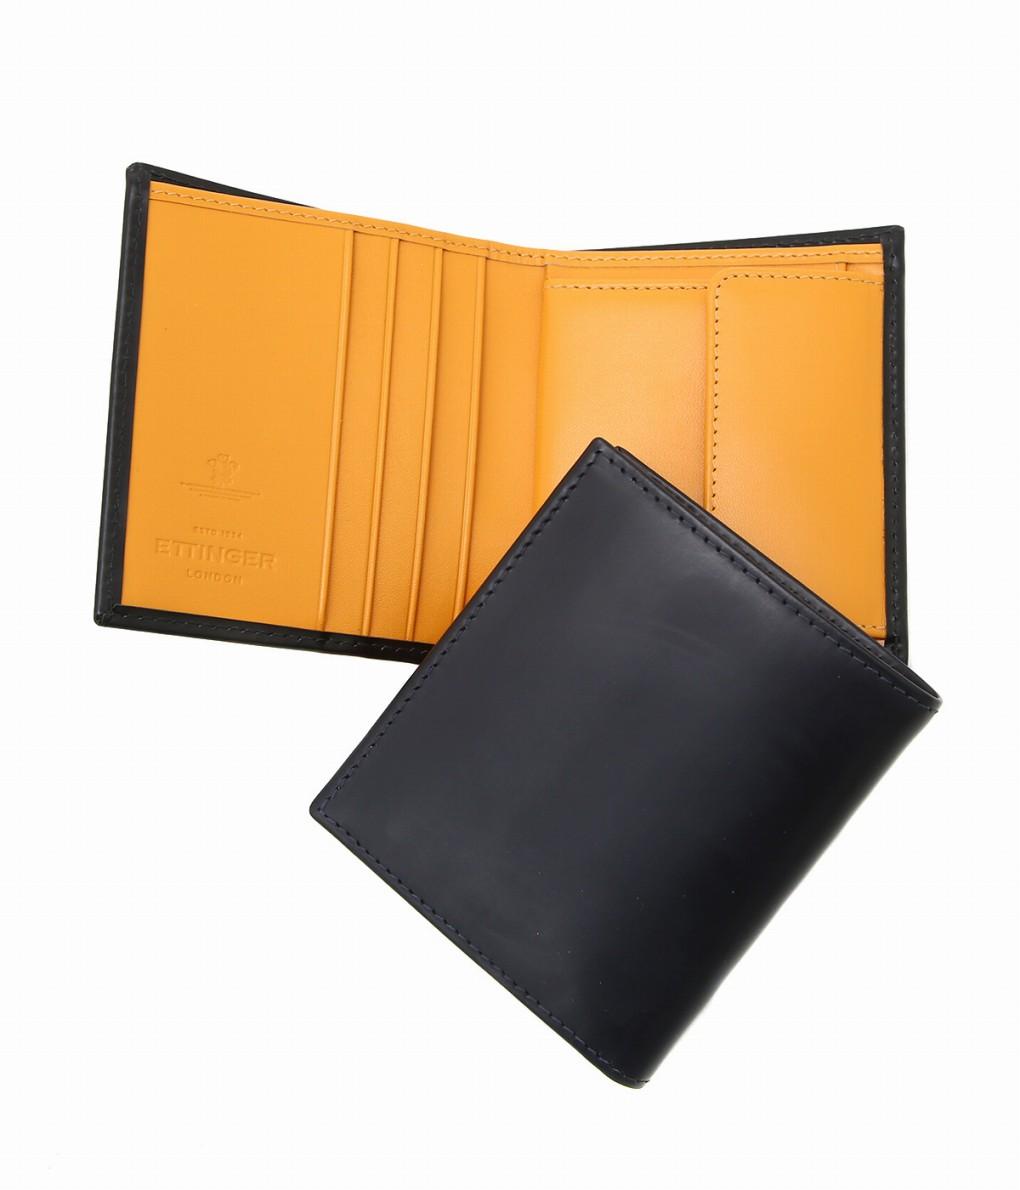 ETTINGER / エッティンガー : Mini Wallet +Coin Pocket Bridle : 財布 ミニウォレット レザー : BH975A 【MUS】